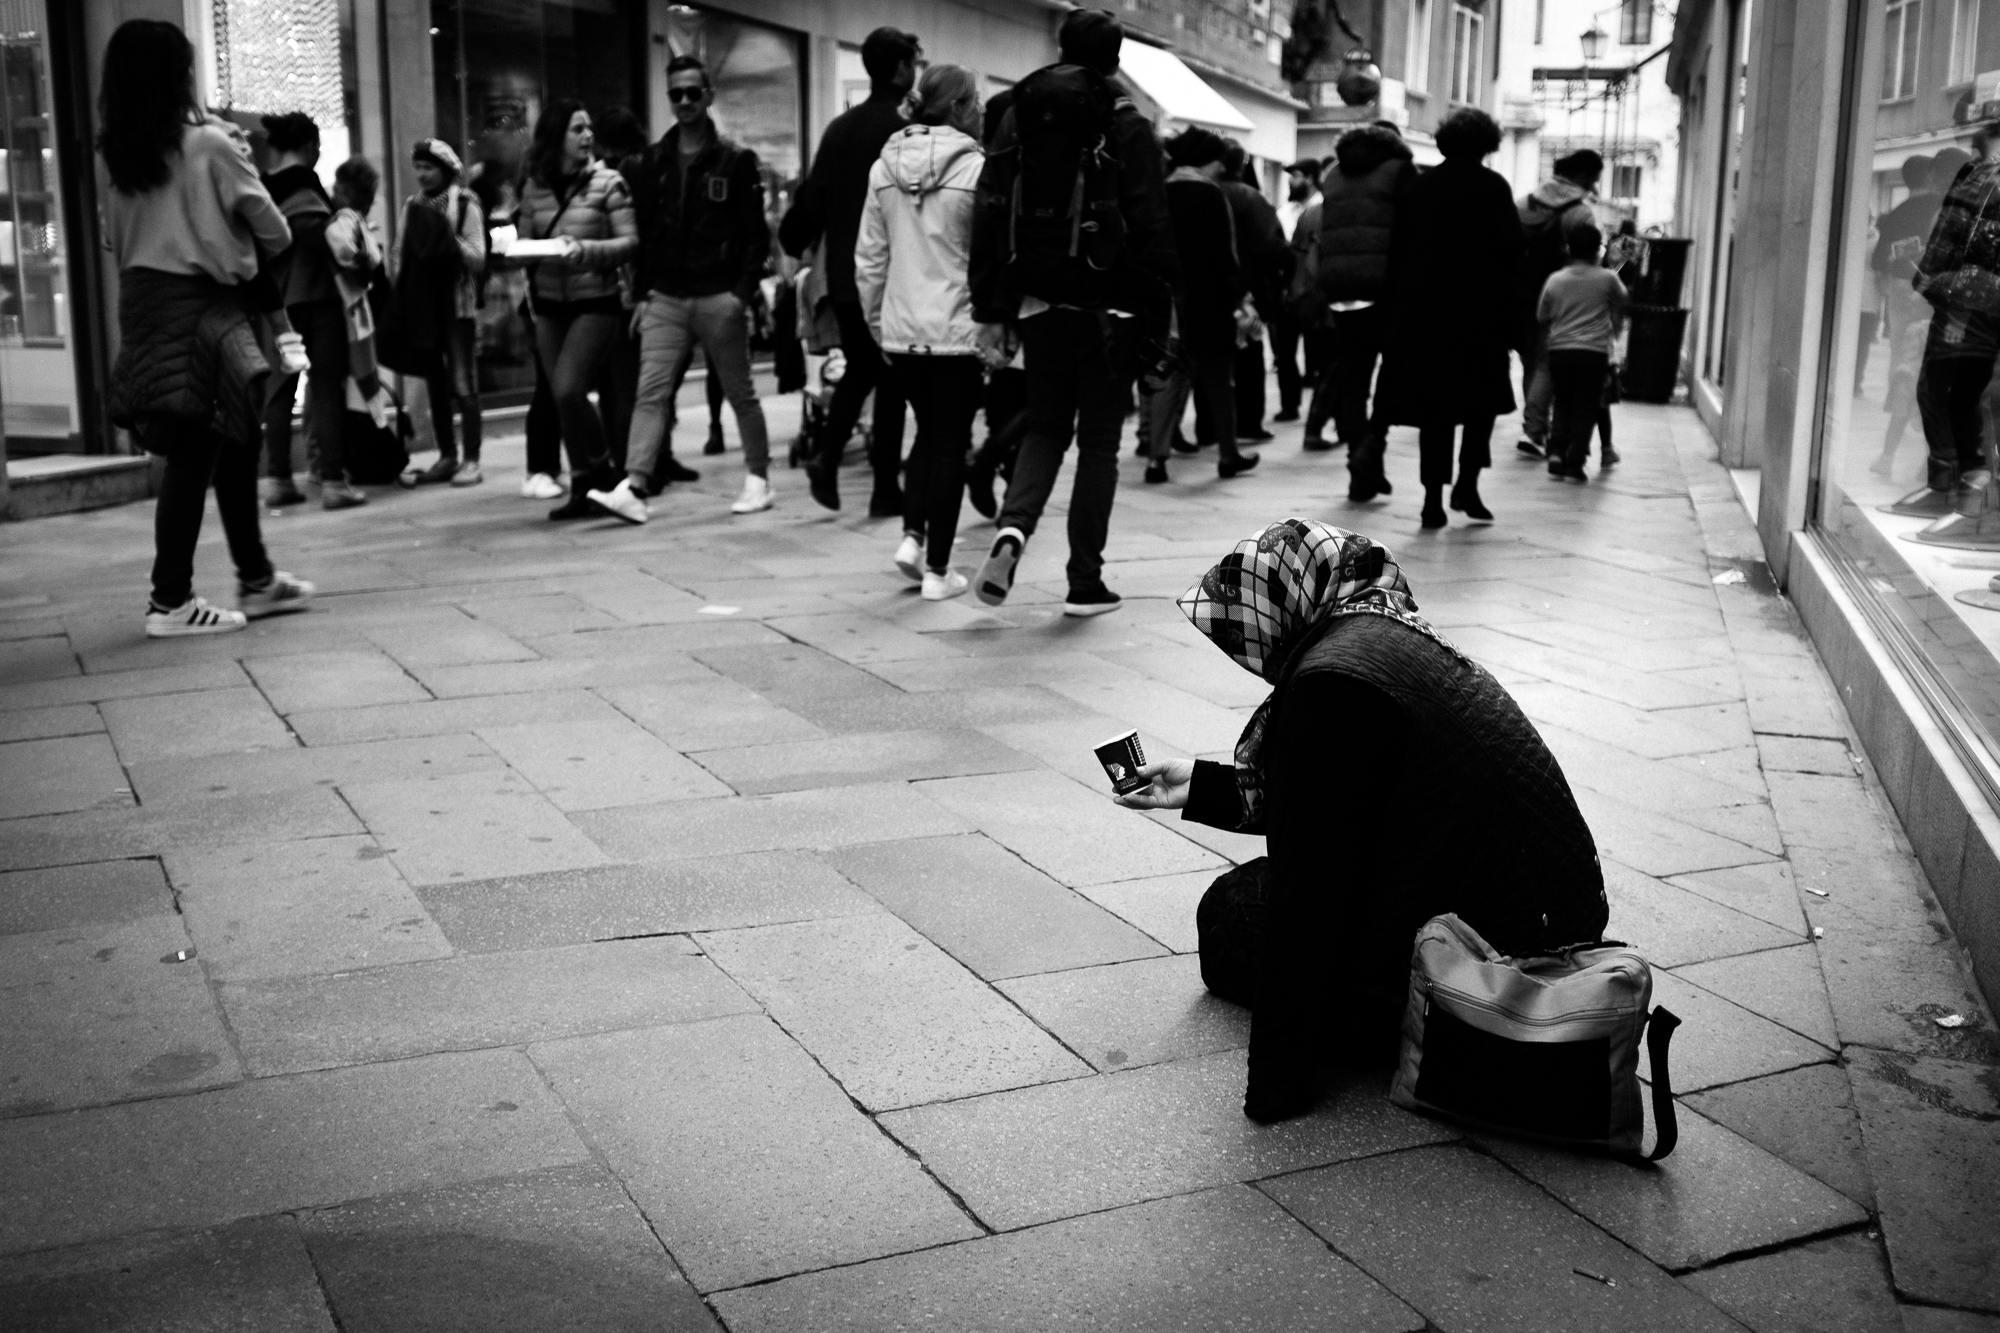 Street scene of a beggar among shoppers in Venice